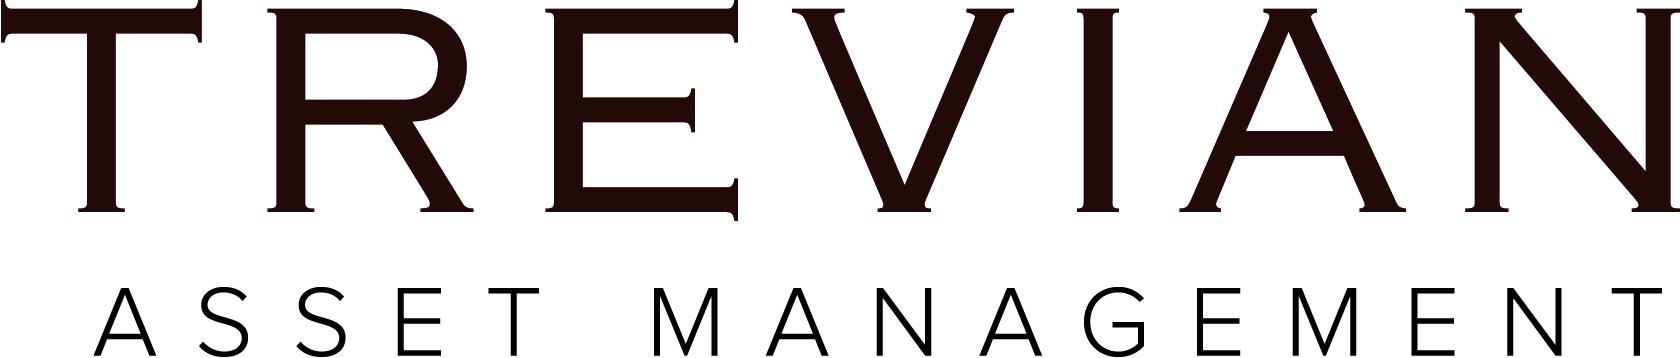 Trevian Asset Management Oy